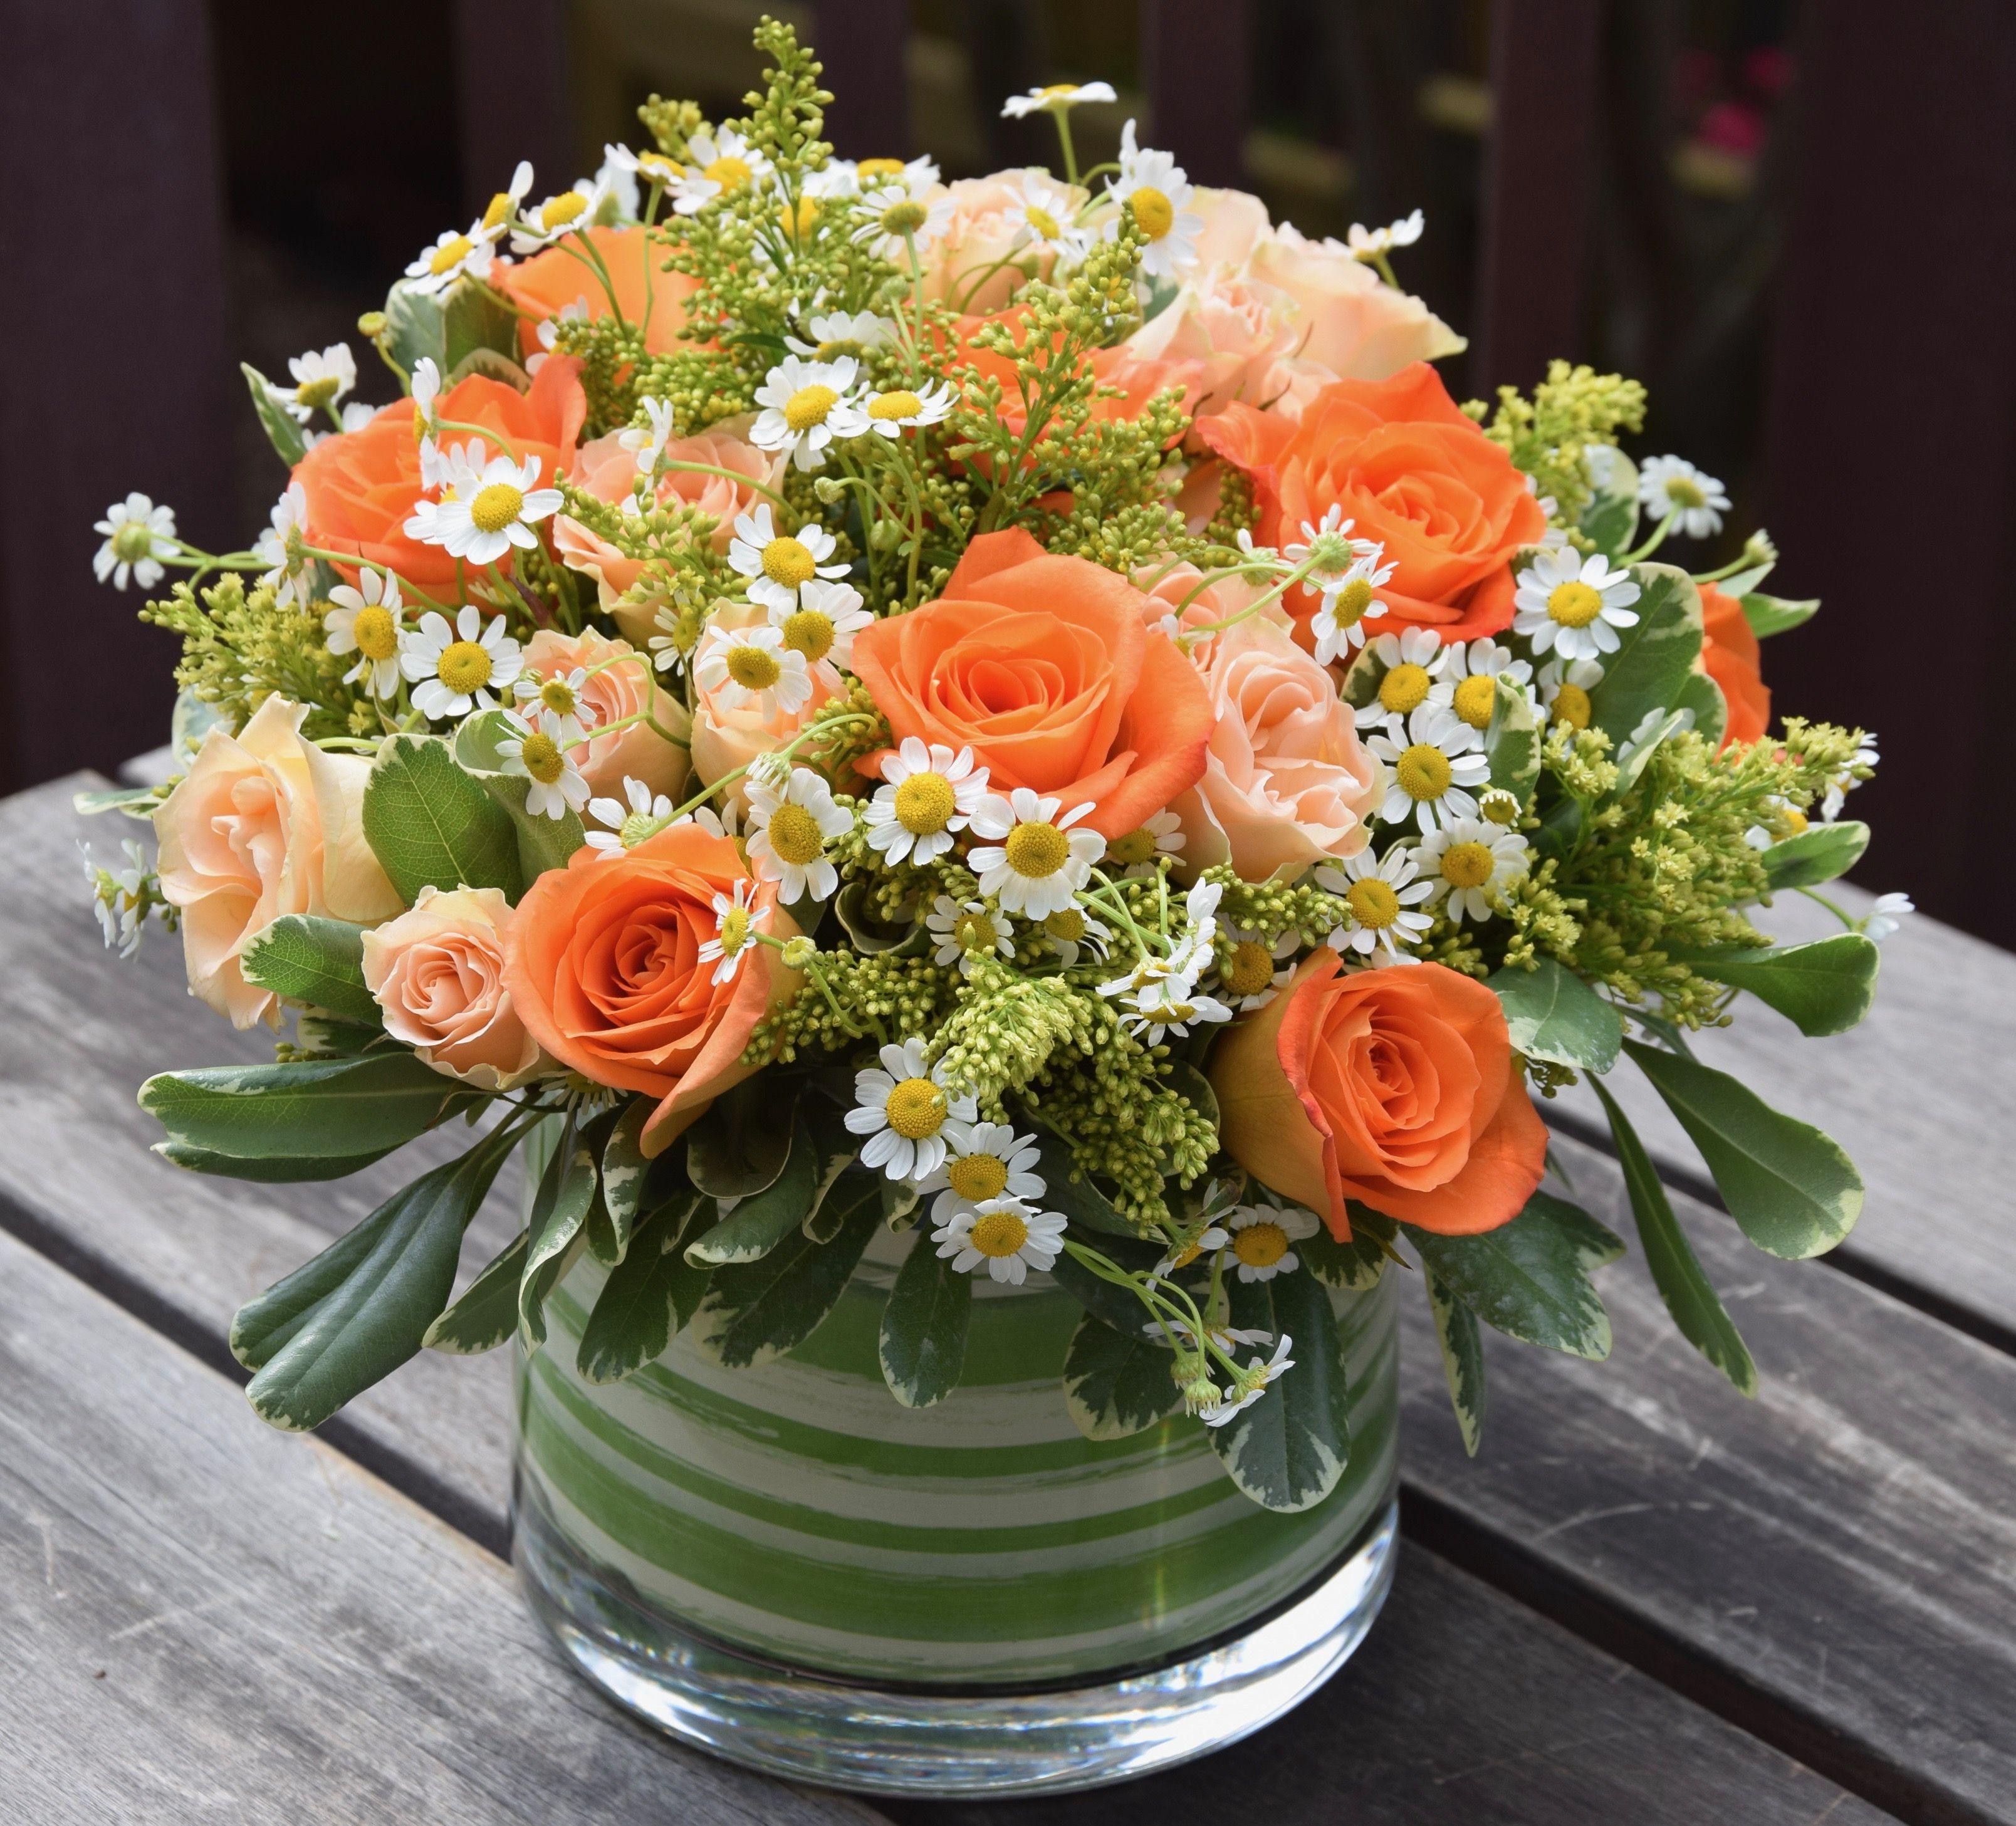 Spring flower arrangement. Spring flower arrangements